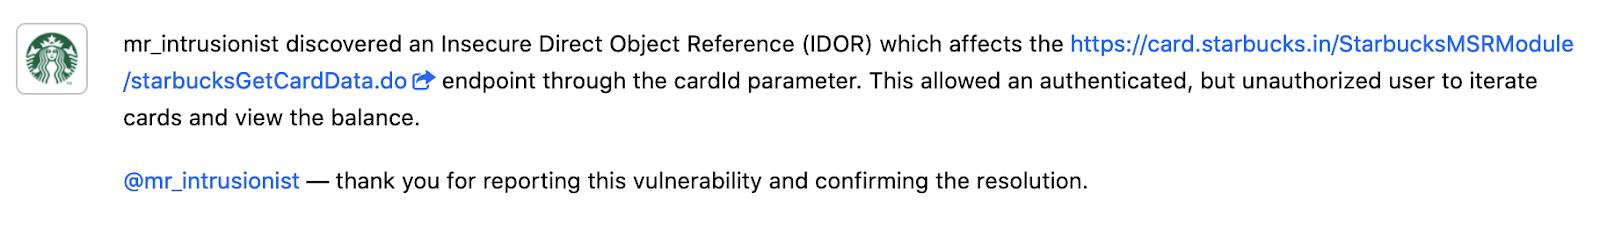 OWASP Broken Access Control: View unauthorized balances using an IDOR vulnerability